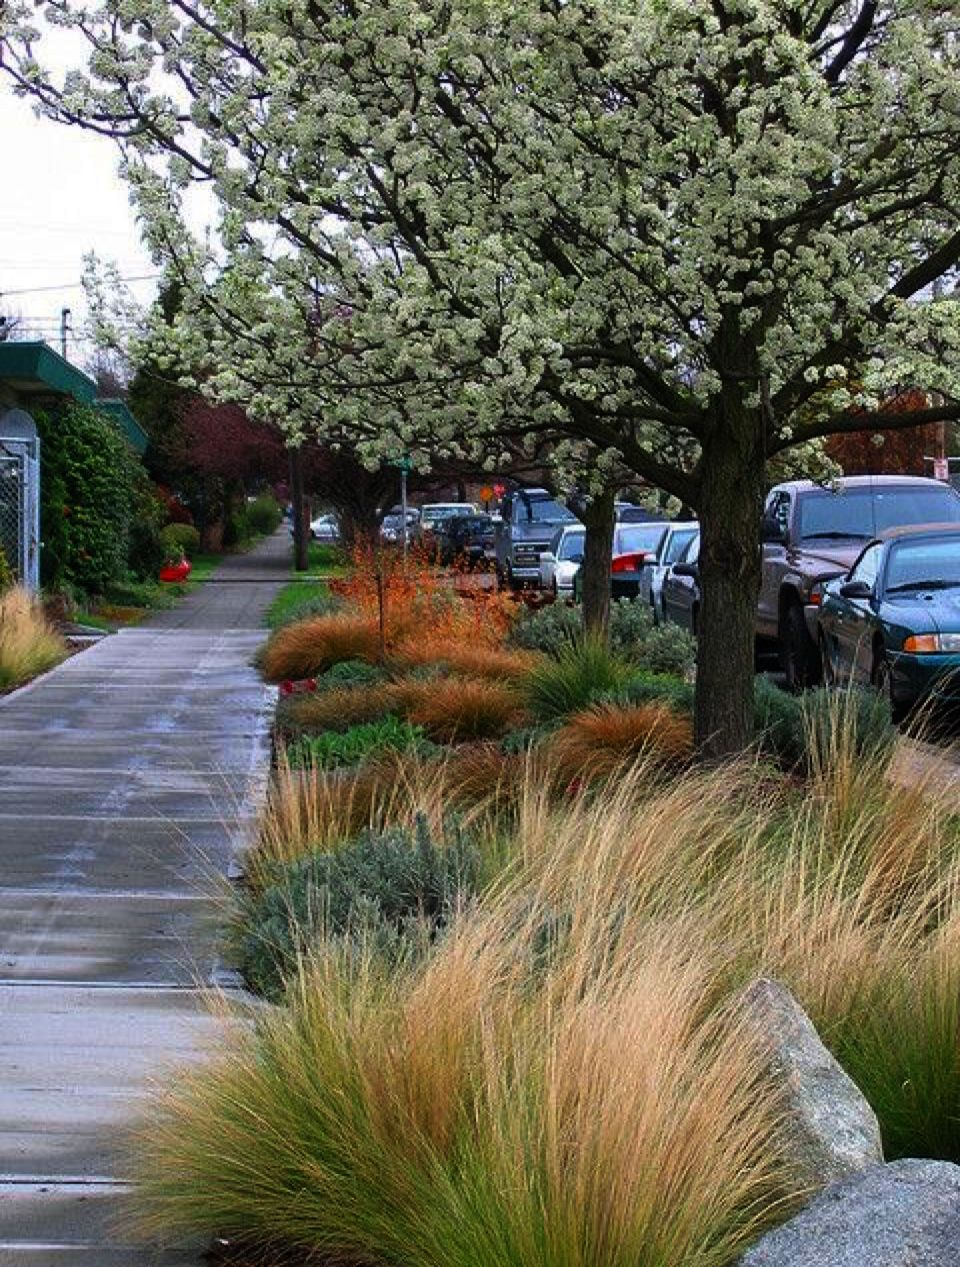 Landscape Gardening Ideas Pictures Landscape Architect Salary China Into Landscape Architecture S Landscape Architecture Landscape Landscape Architecture Jobs